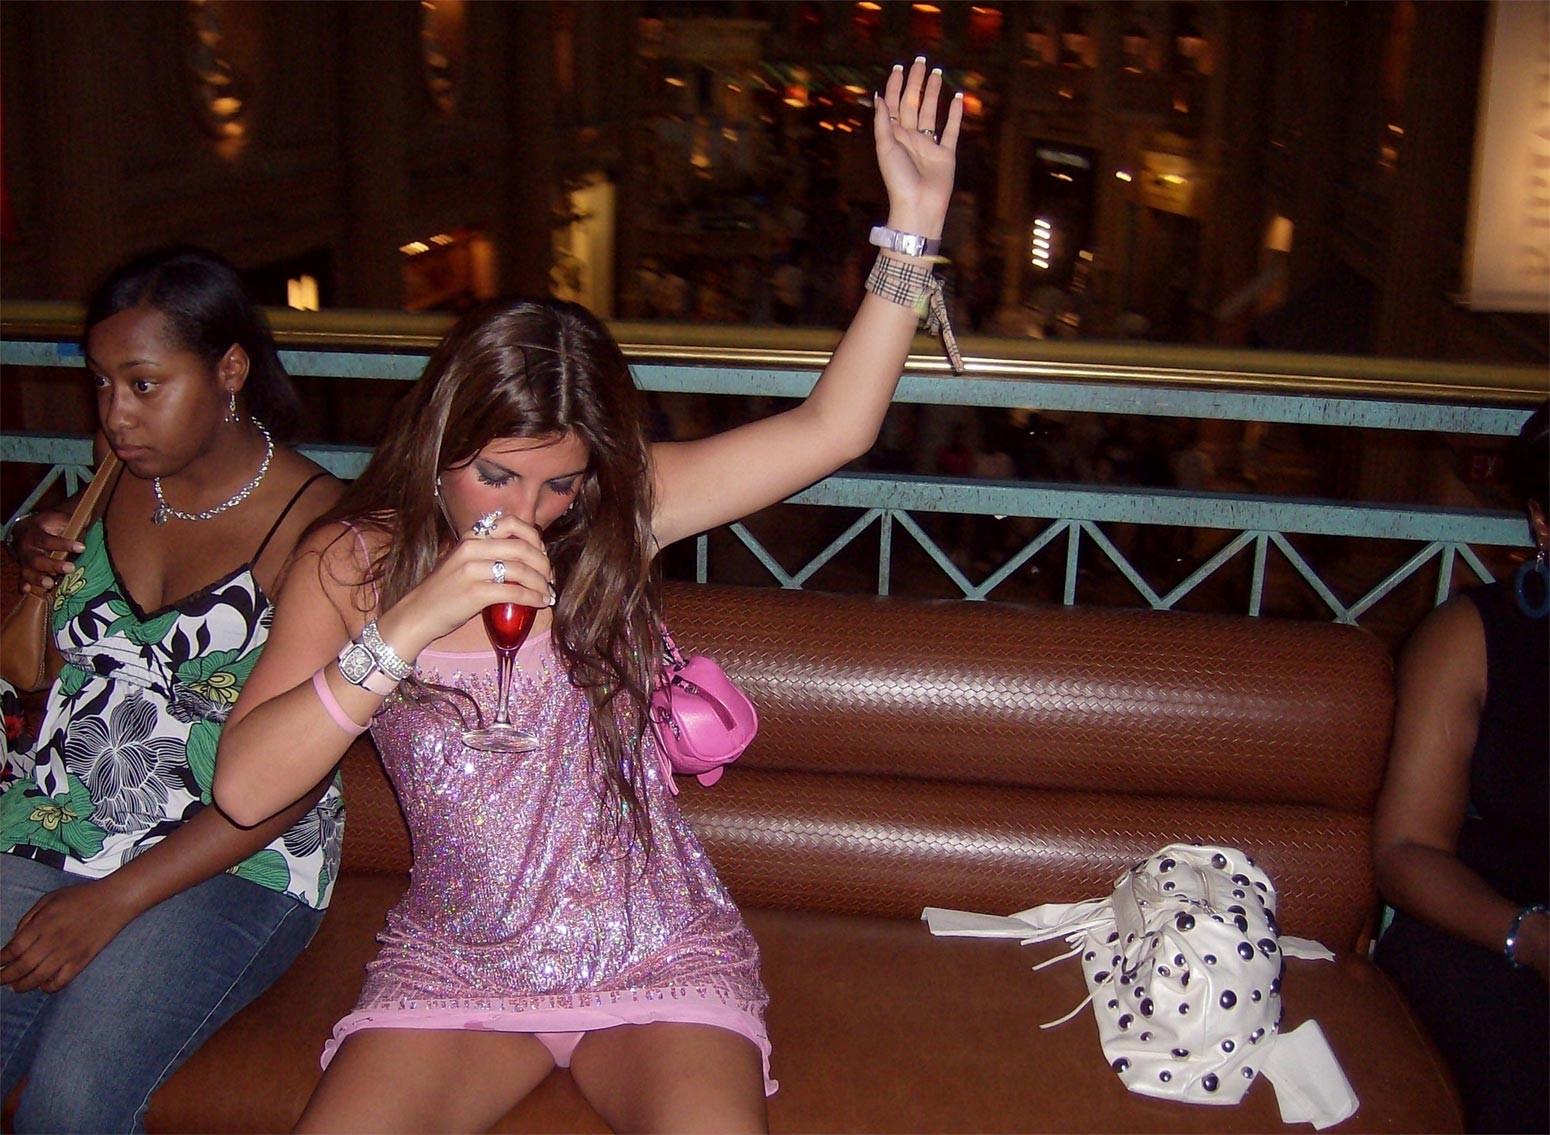 girls-petite-drunk-sluts-girl